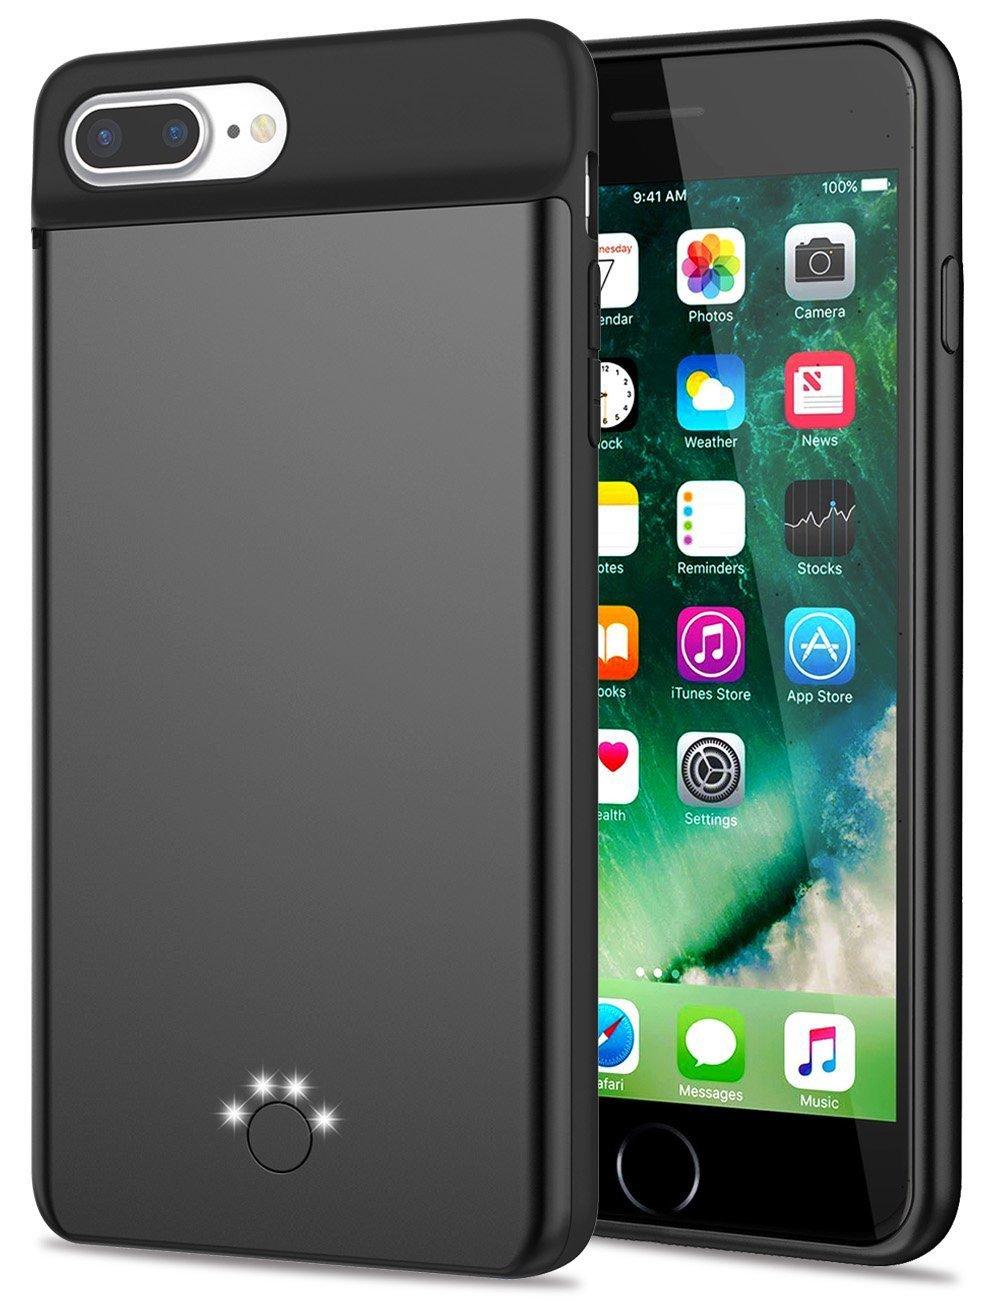 iPhone 8 plus/7 plus/6 plus/6S plus Battery Case,Emishine Ultra Thin Rechargeable Charging Case for iPhone 8 plus/7 plus/6 plus/6S plus Case Battery with 4000mAh (Black-5.5'')